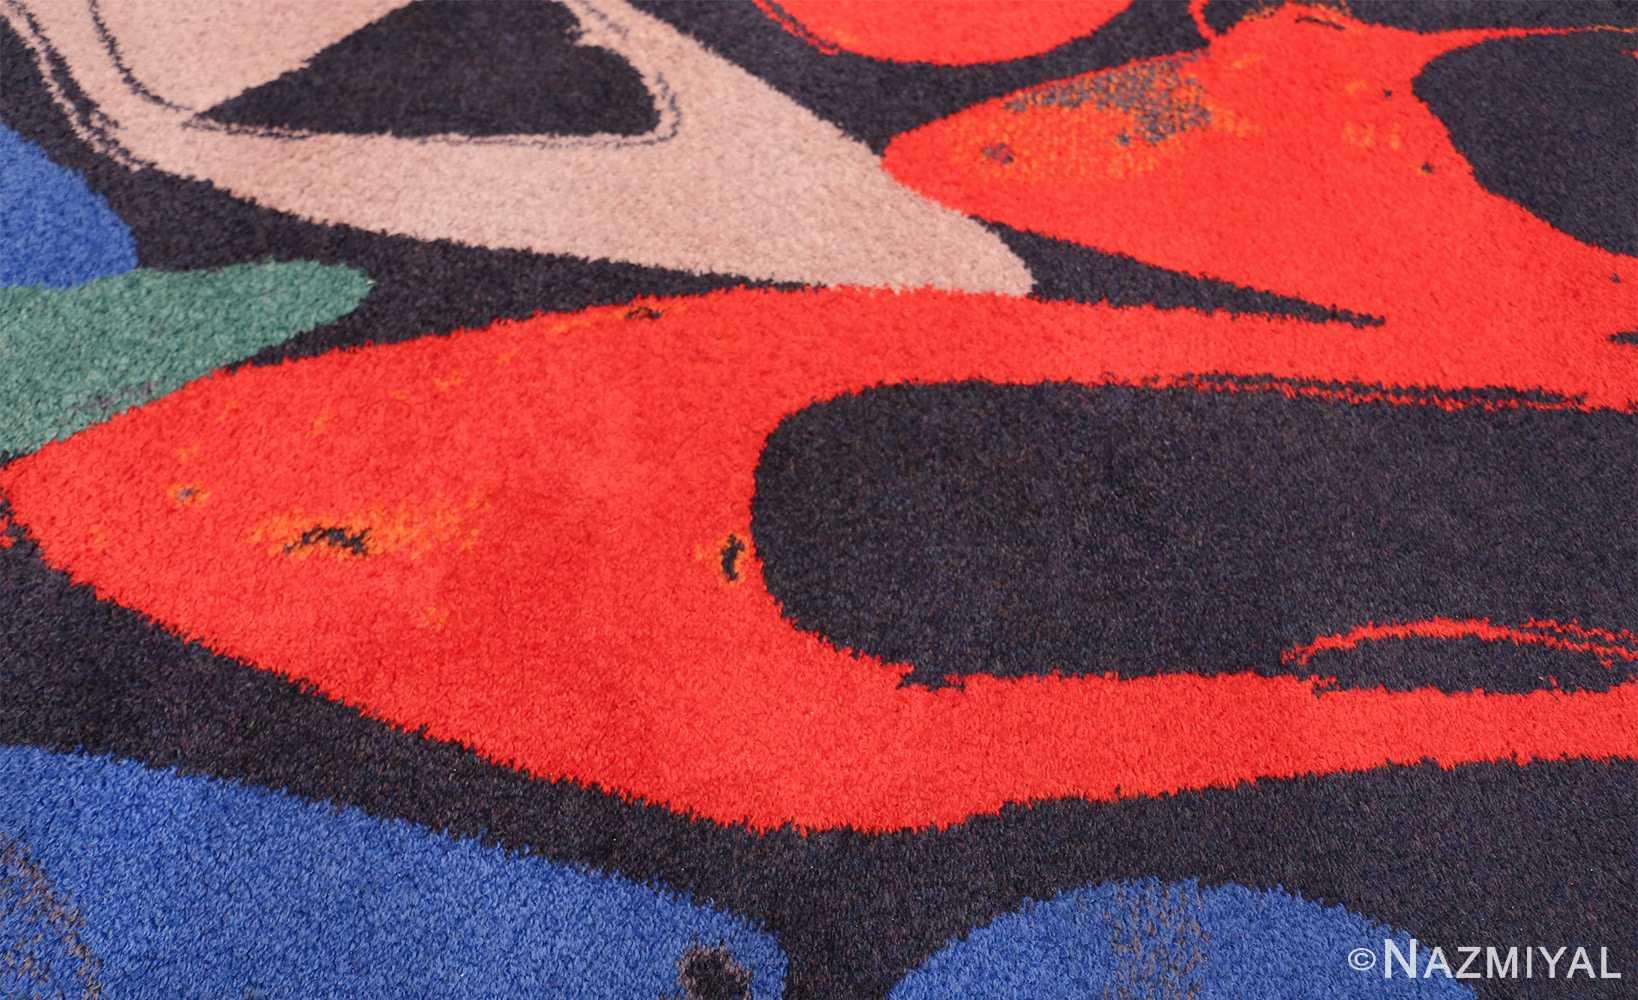 Vintage Andy Warhol Ege Art Line Diamond Dust Shoes Scandinavian rug 49784 shoes Nazmiyal